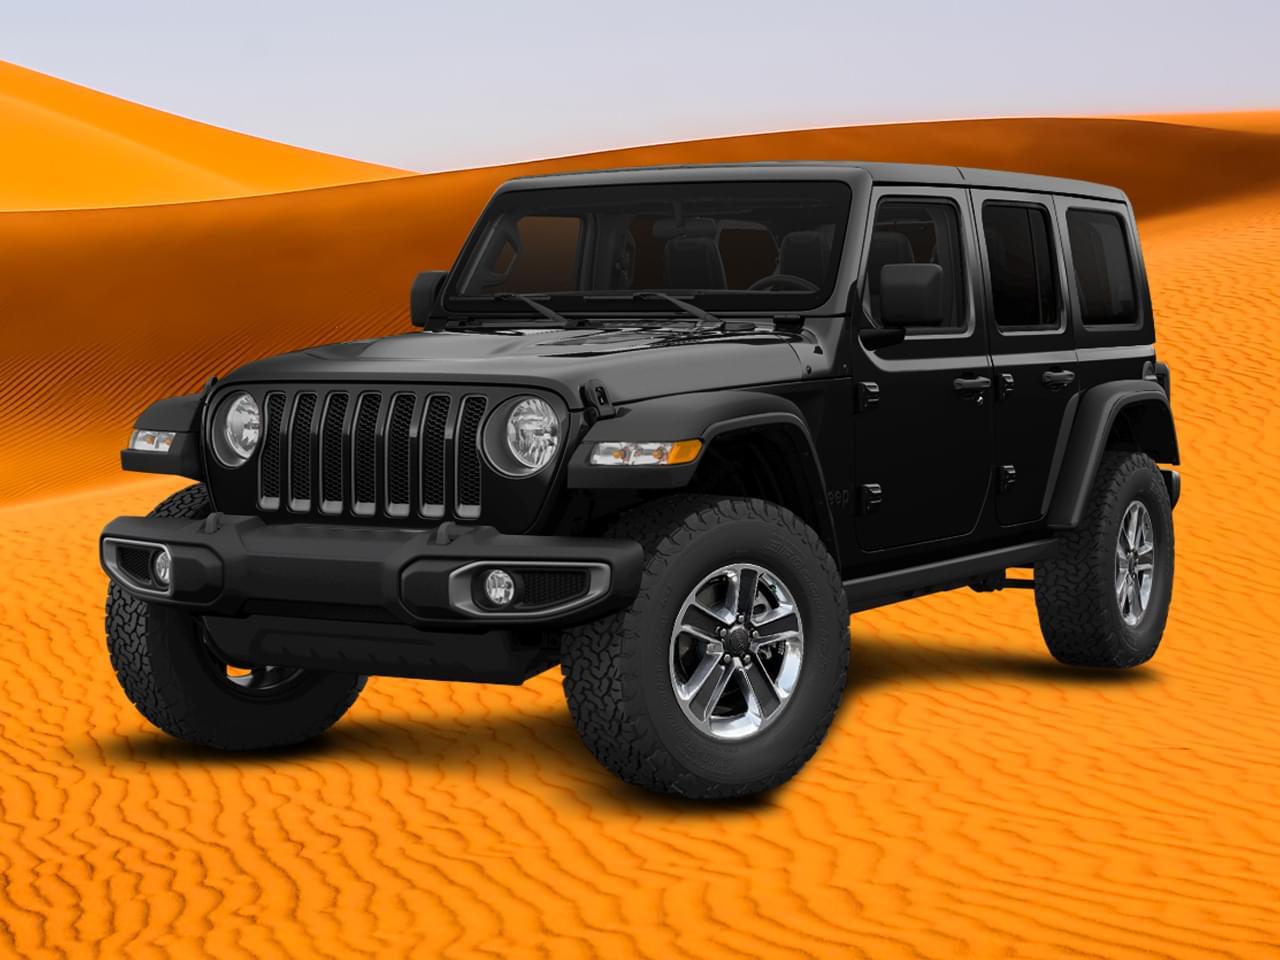 Jeep Wrangler Unlimited Sahara 2.0 T-GDI 4x4 MY21